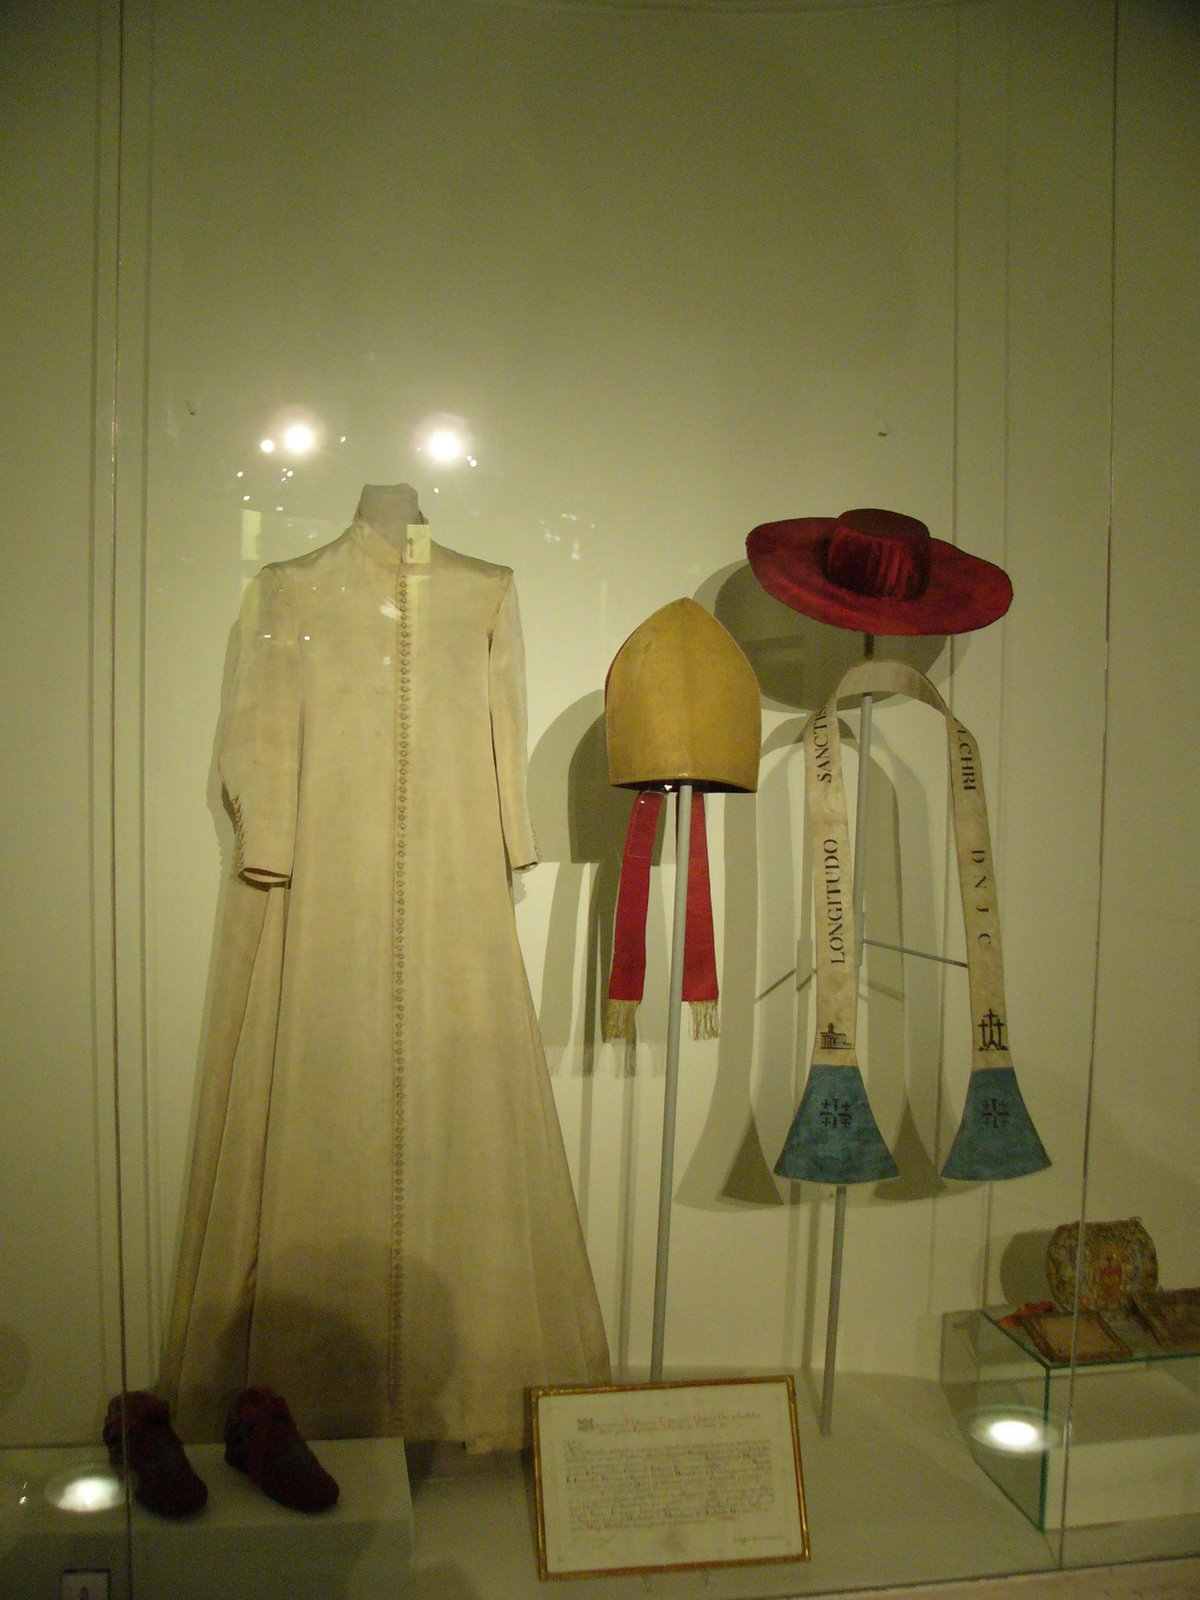 [Charles_Borromeo_clothes_in_Karlskirche.jpg]